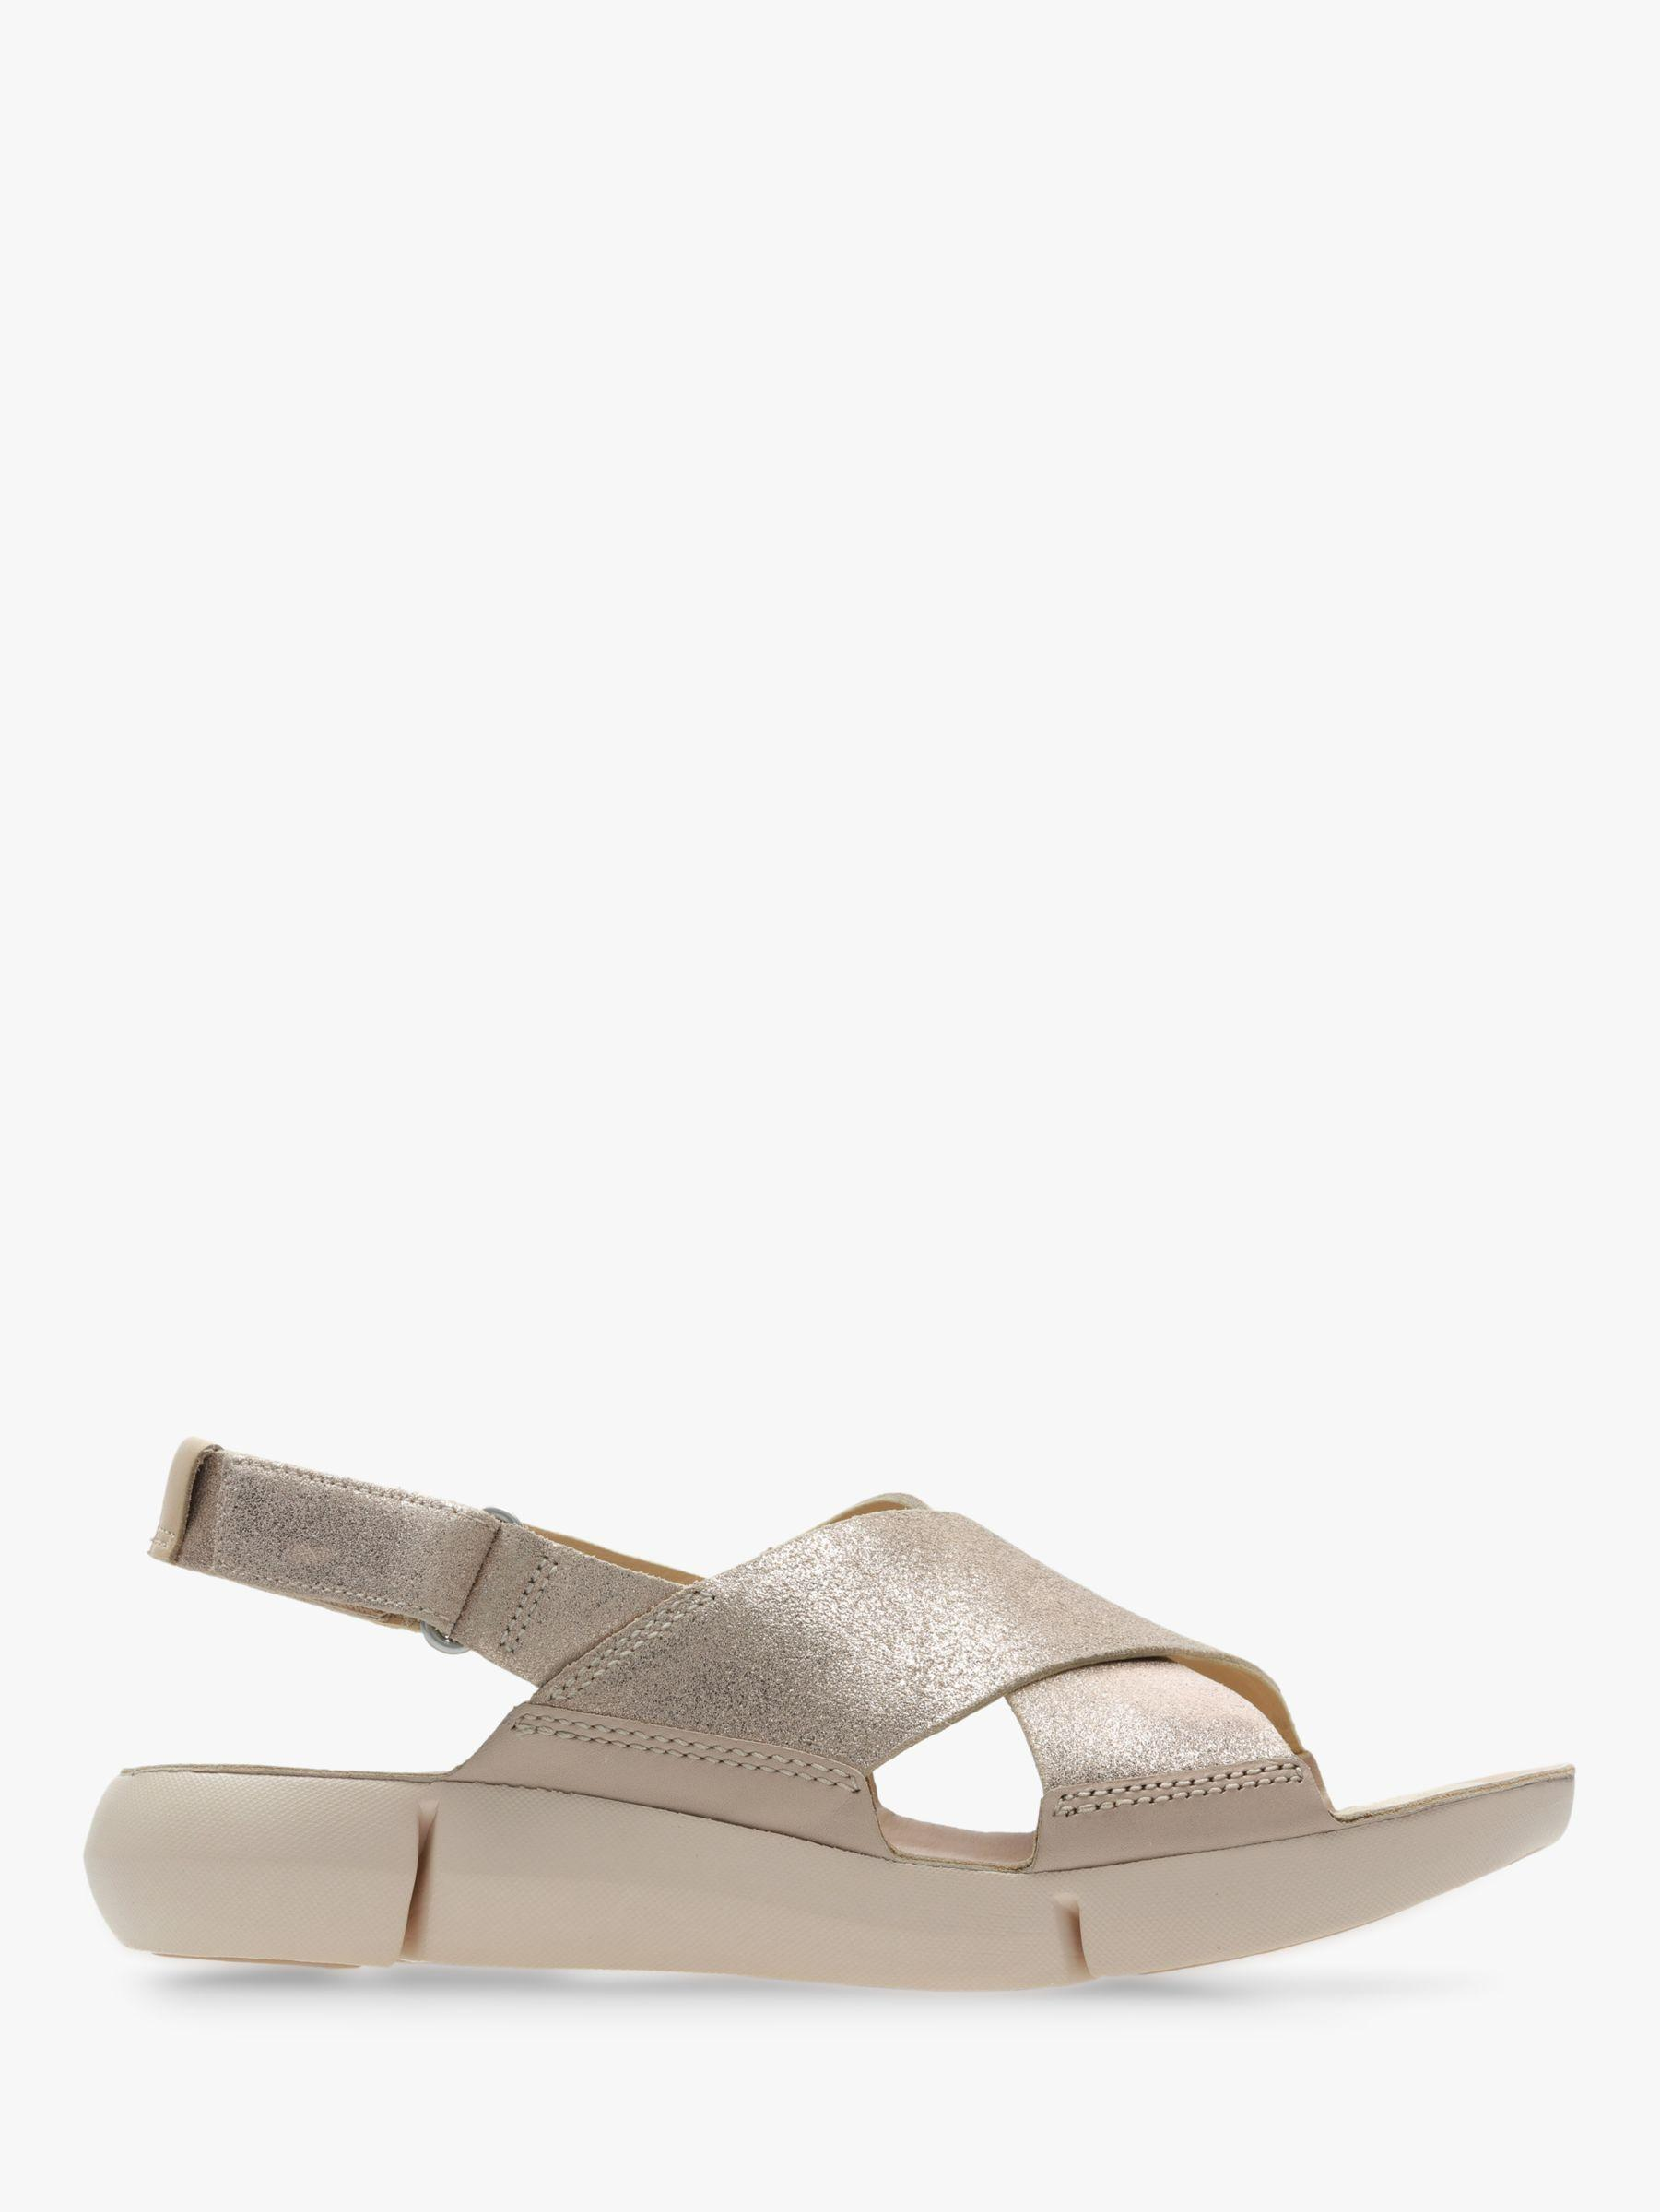 1f25b5088b3 Clarks. Women s Tri Chloe Cross Strap Sandals